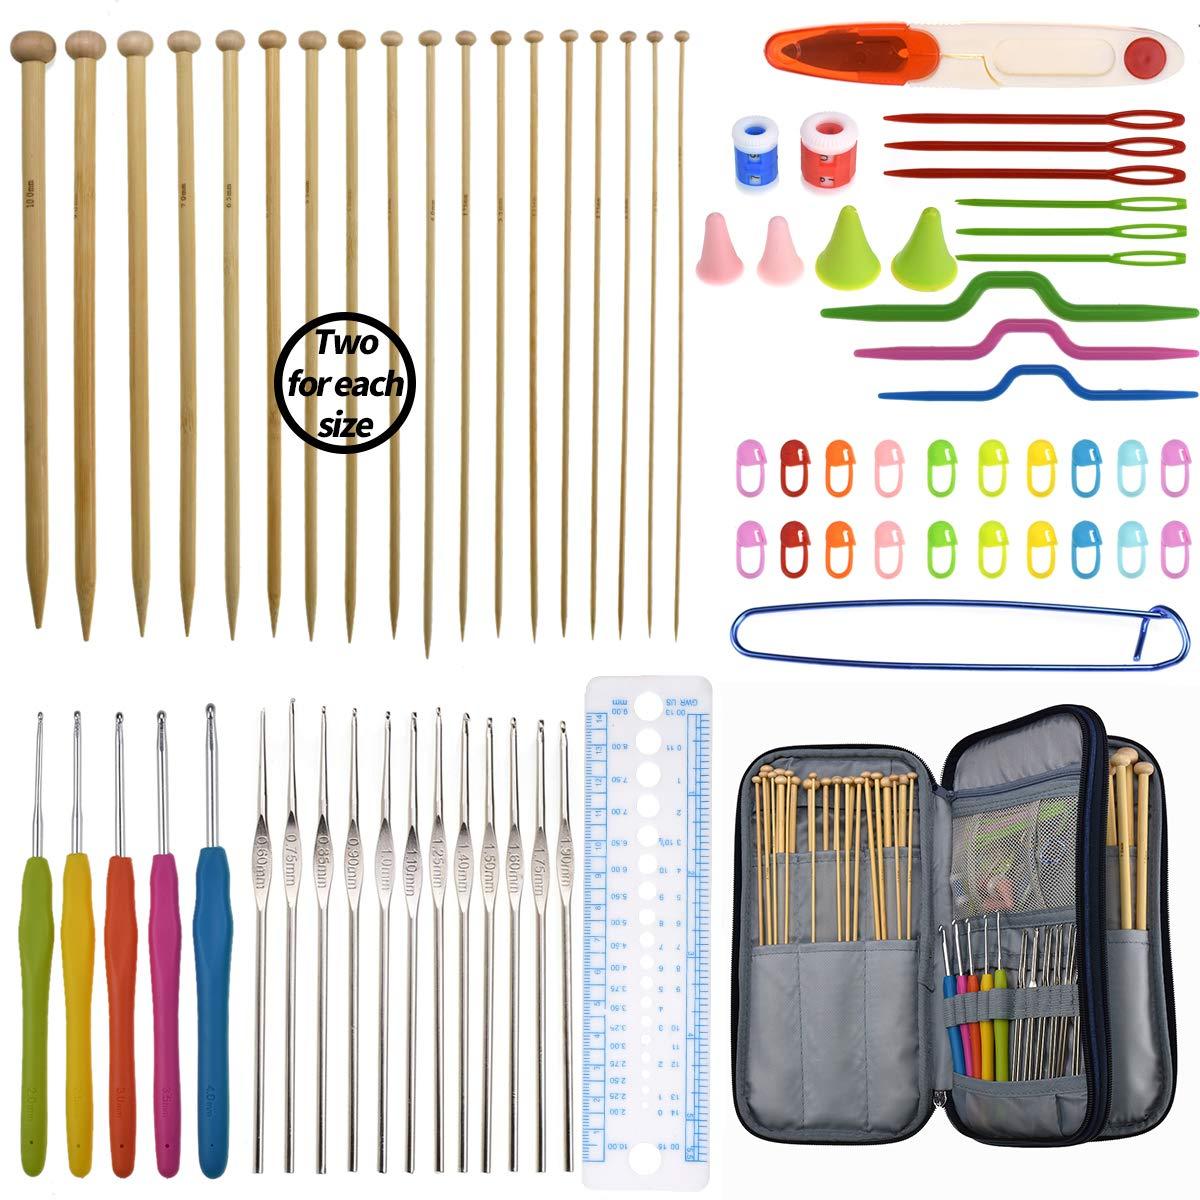 Bamboo Knitting Needles Set 36pcs Carbonized Afghan Needles 5pieces Ergonomic Crochet Hook Set 12 Small Size Aluminum Handle Hook with Sewing Tools Full DIY Craft Kits